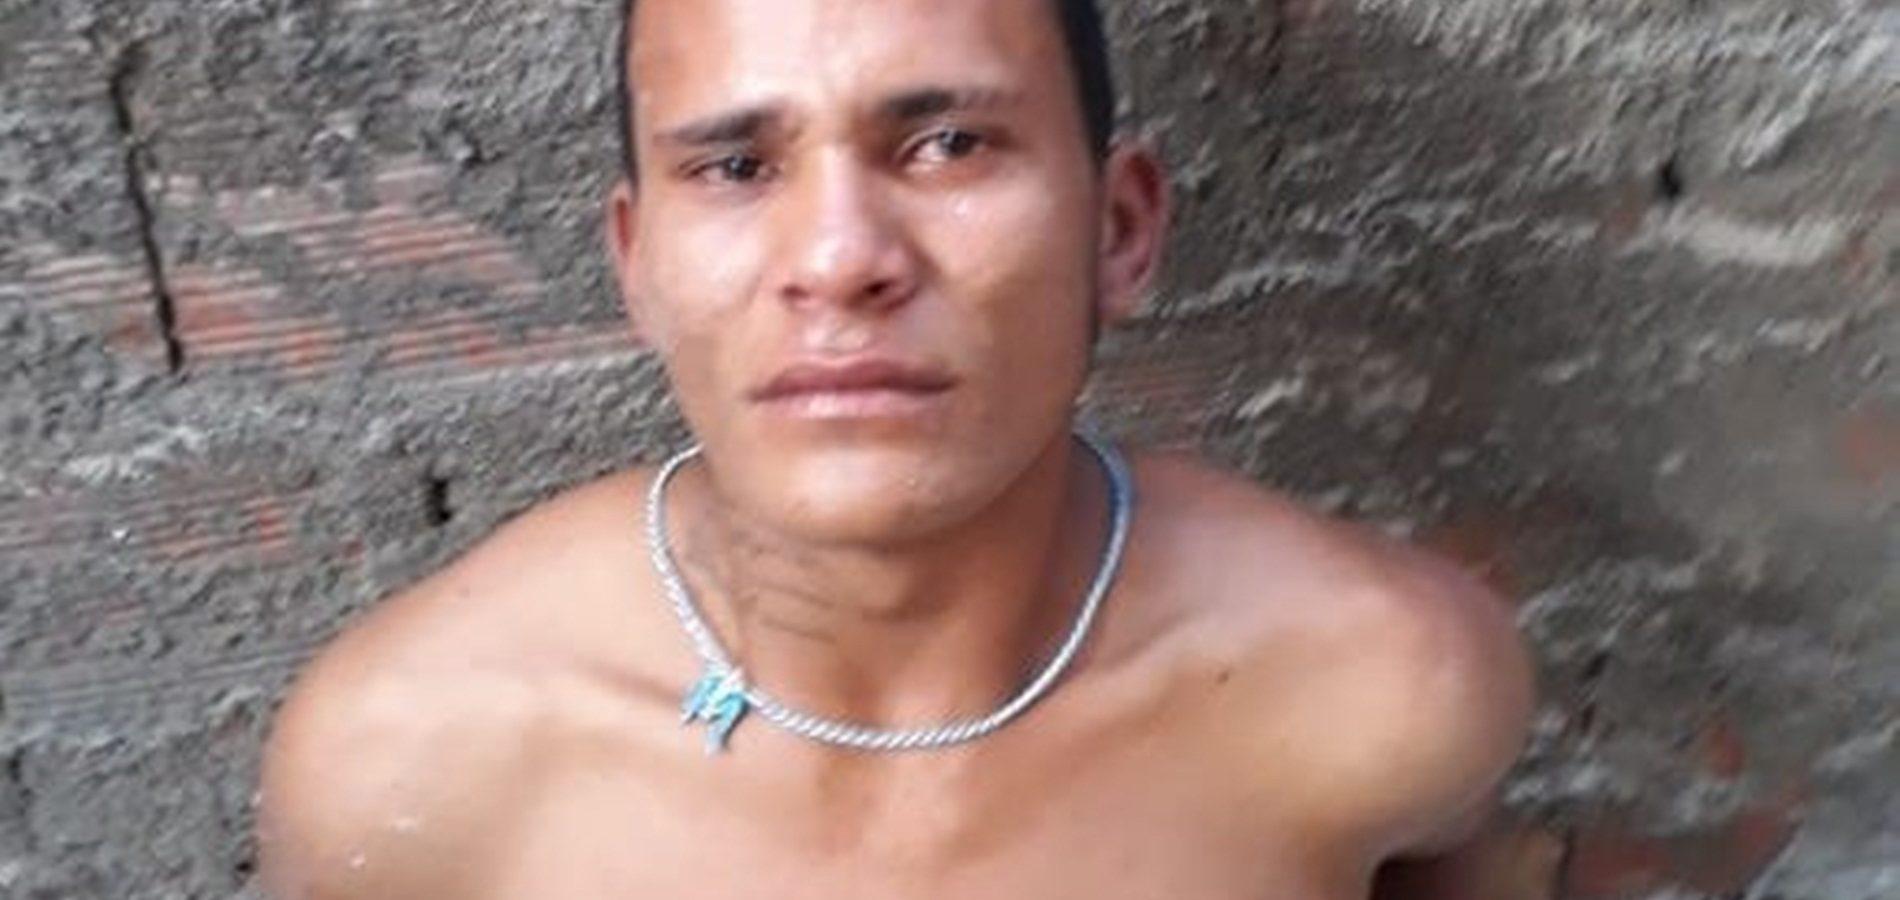 Jovem natural de Picos é preso no Ceará suspeito de matar bisavó